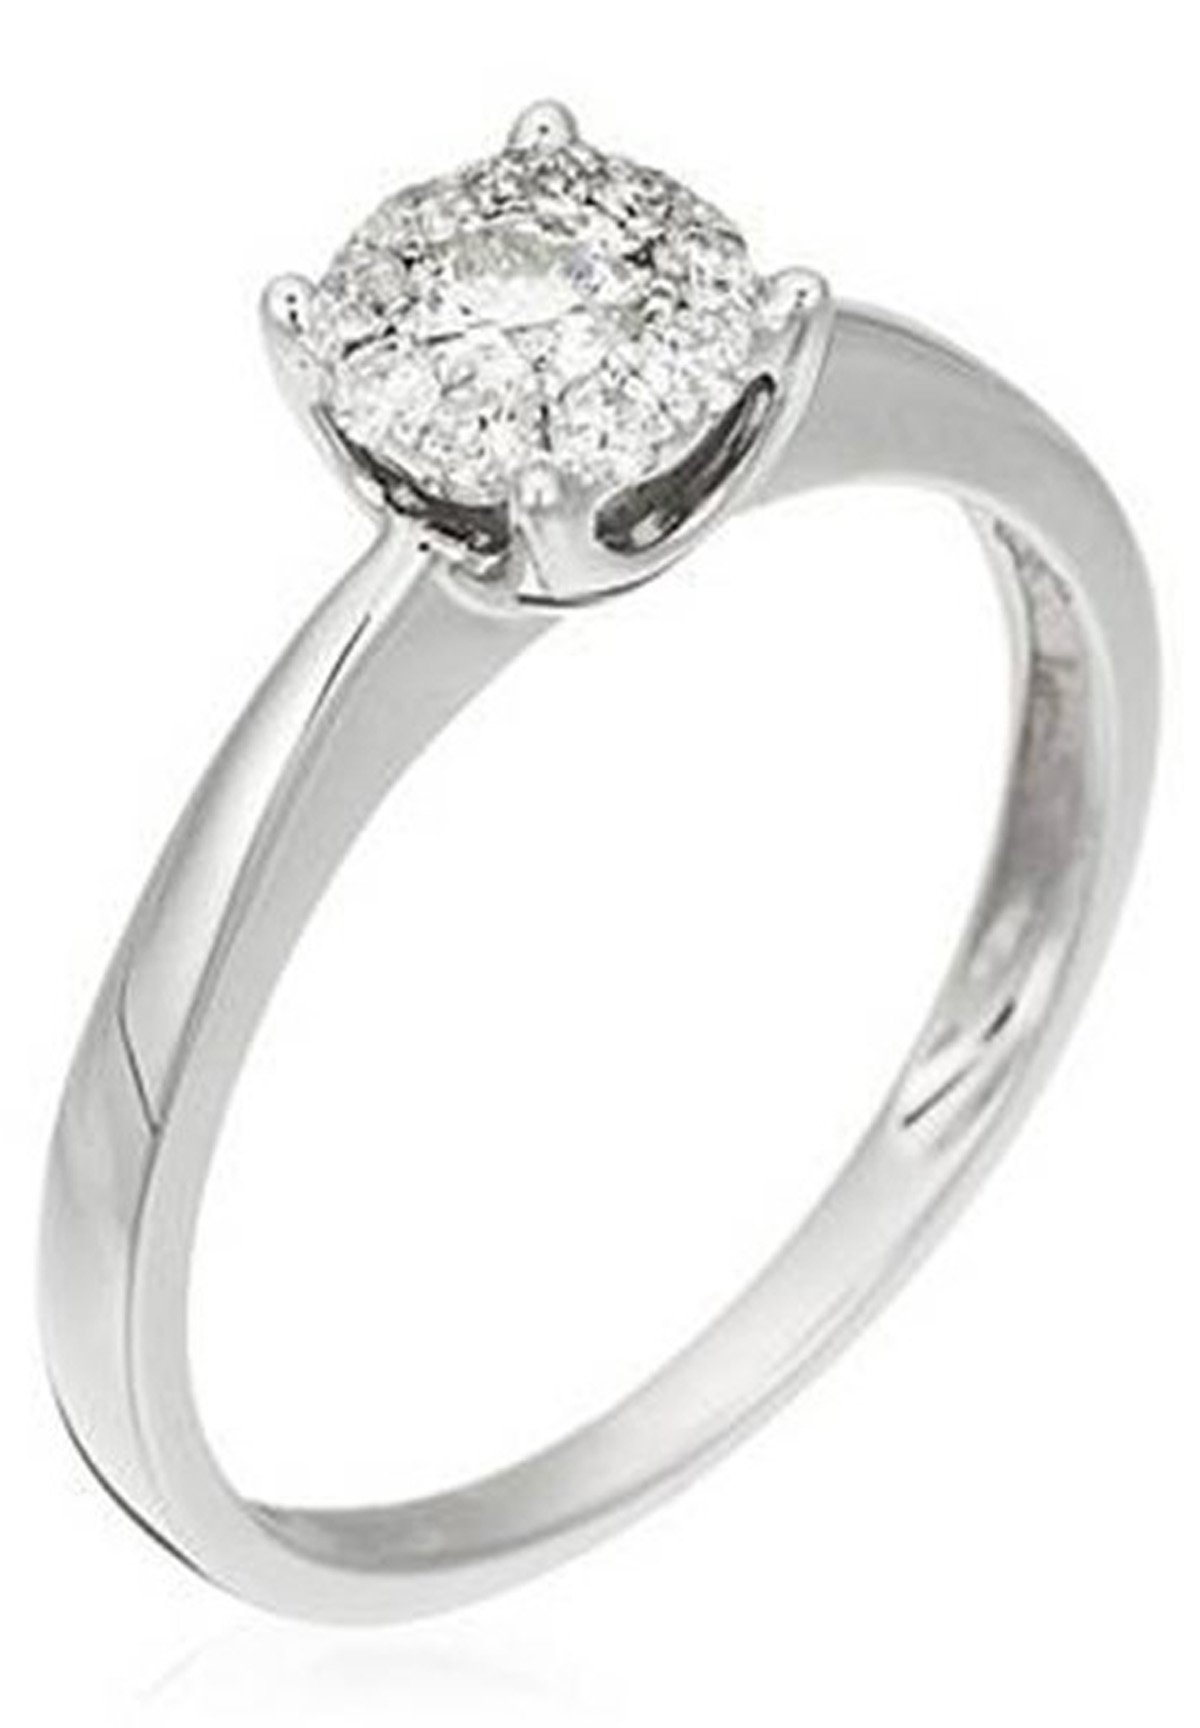 Damen WHITE GOLD RING 9K CERTIFIED 10 DIAMONDS HSI AND 9 DIAMONDS 0.27 CT - Ring